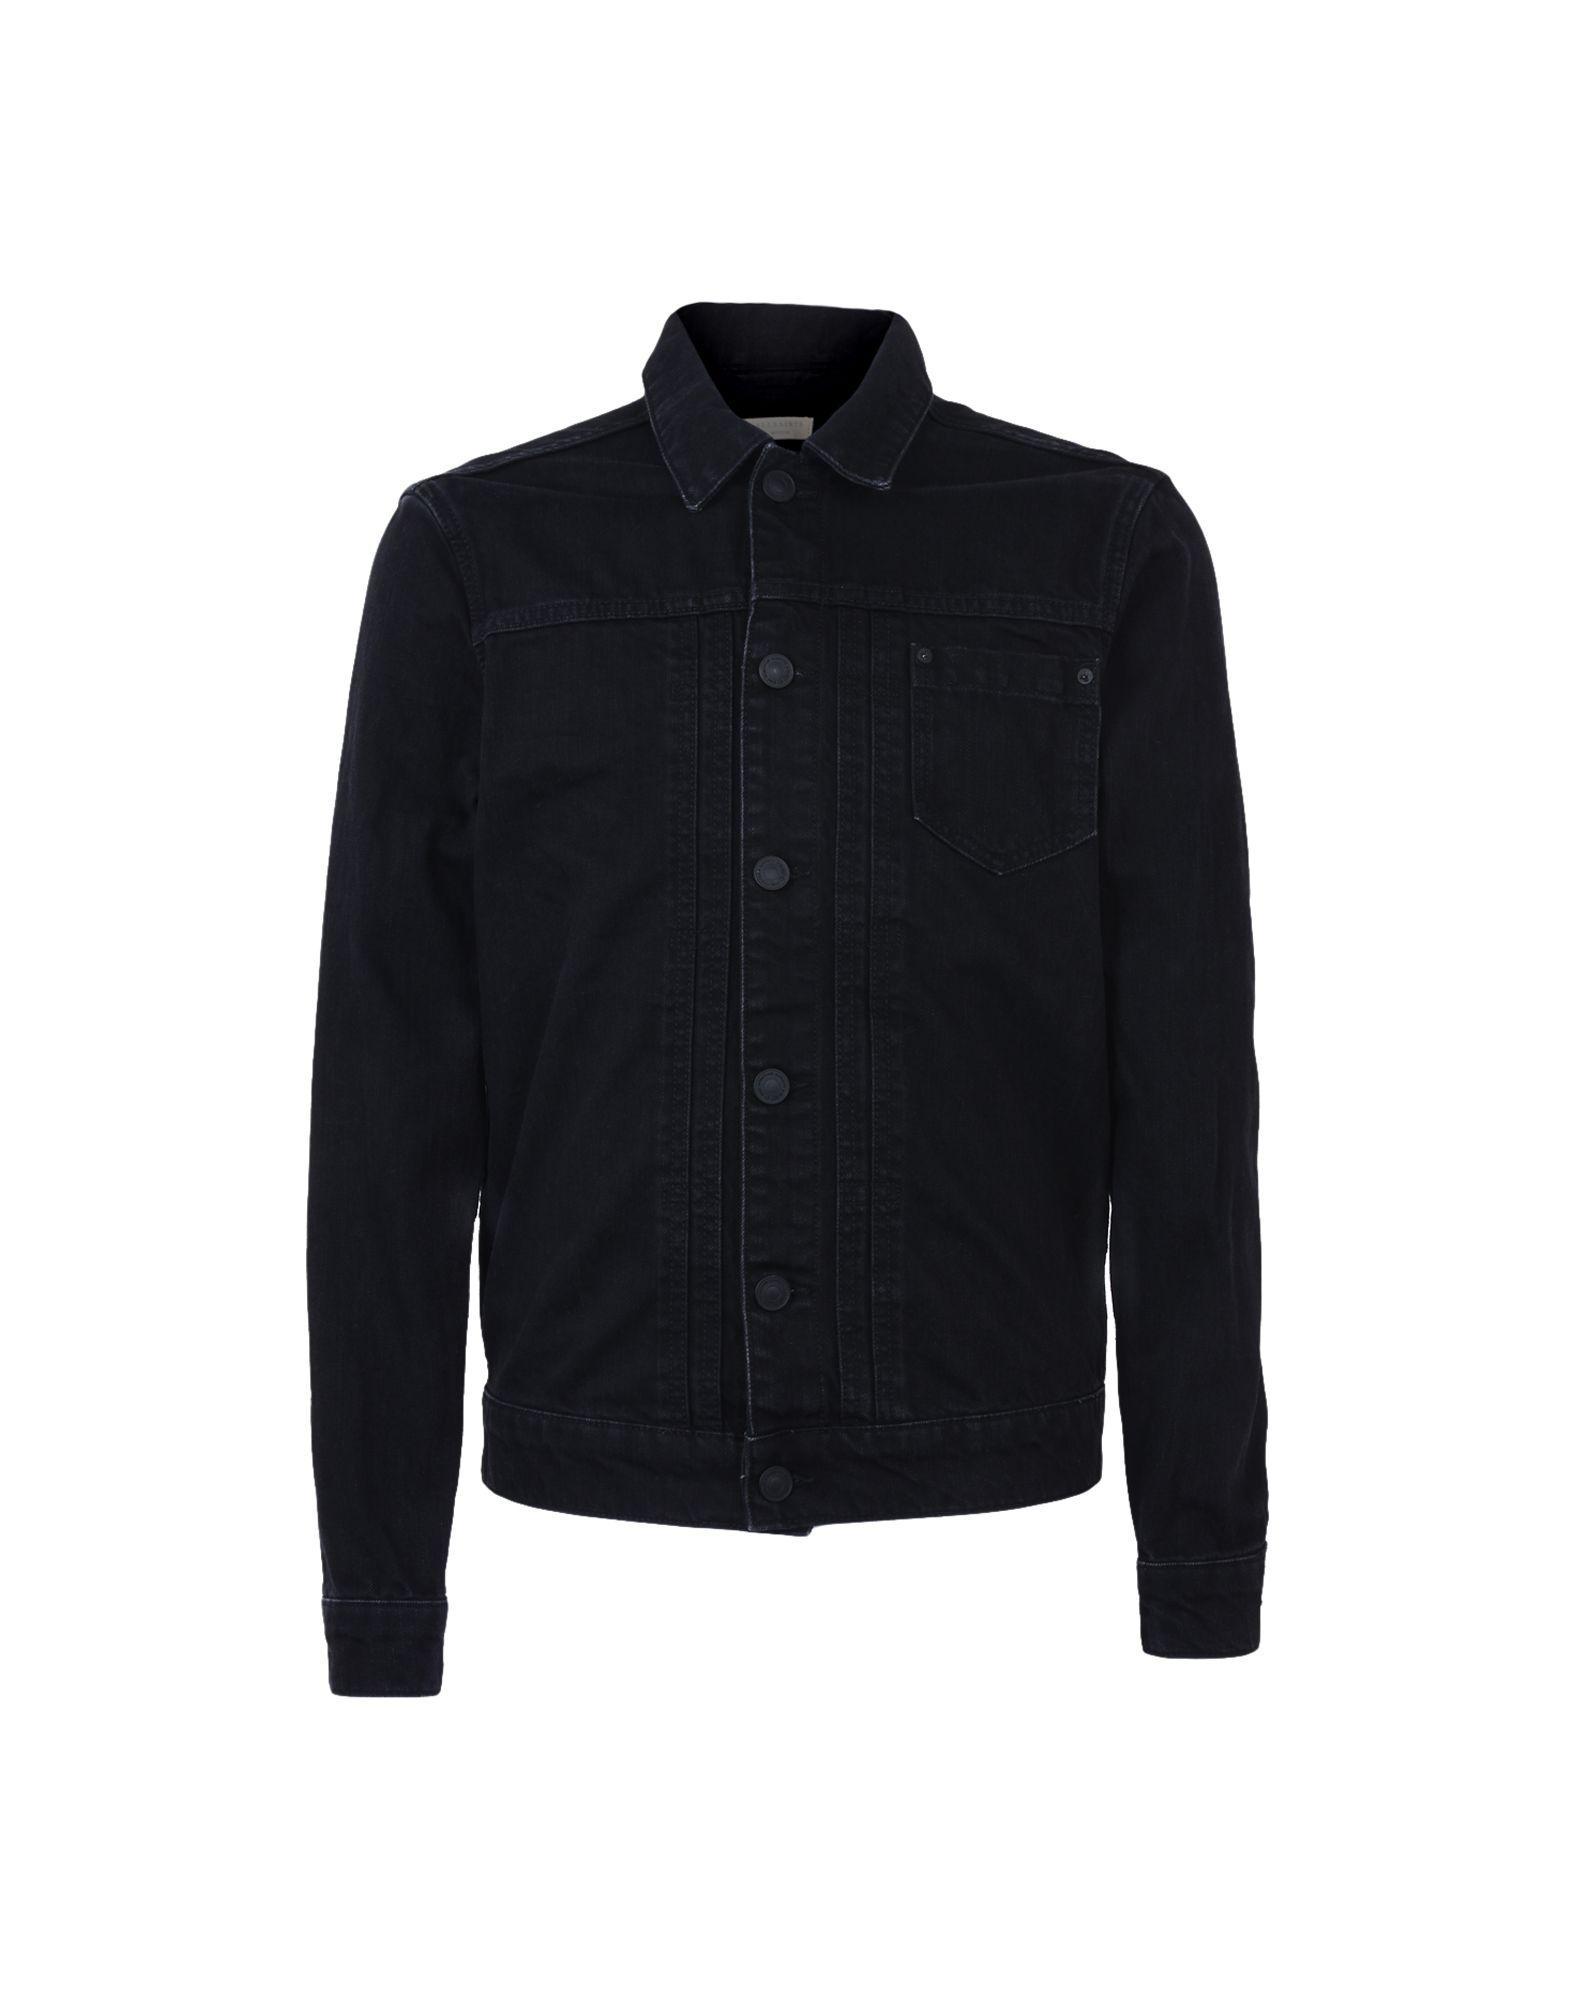 Allsaints Denim Outerwear In Black